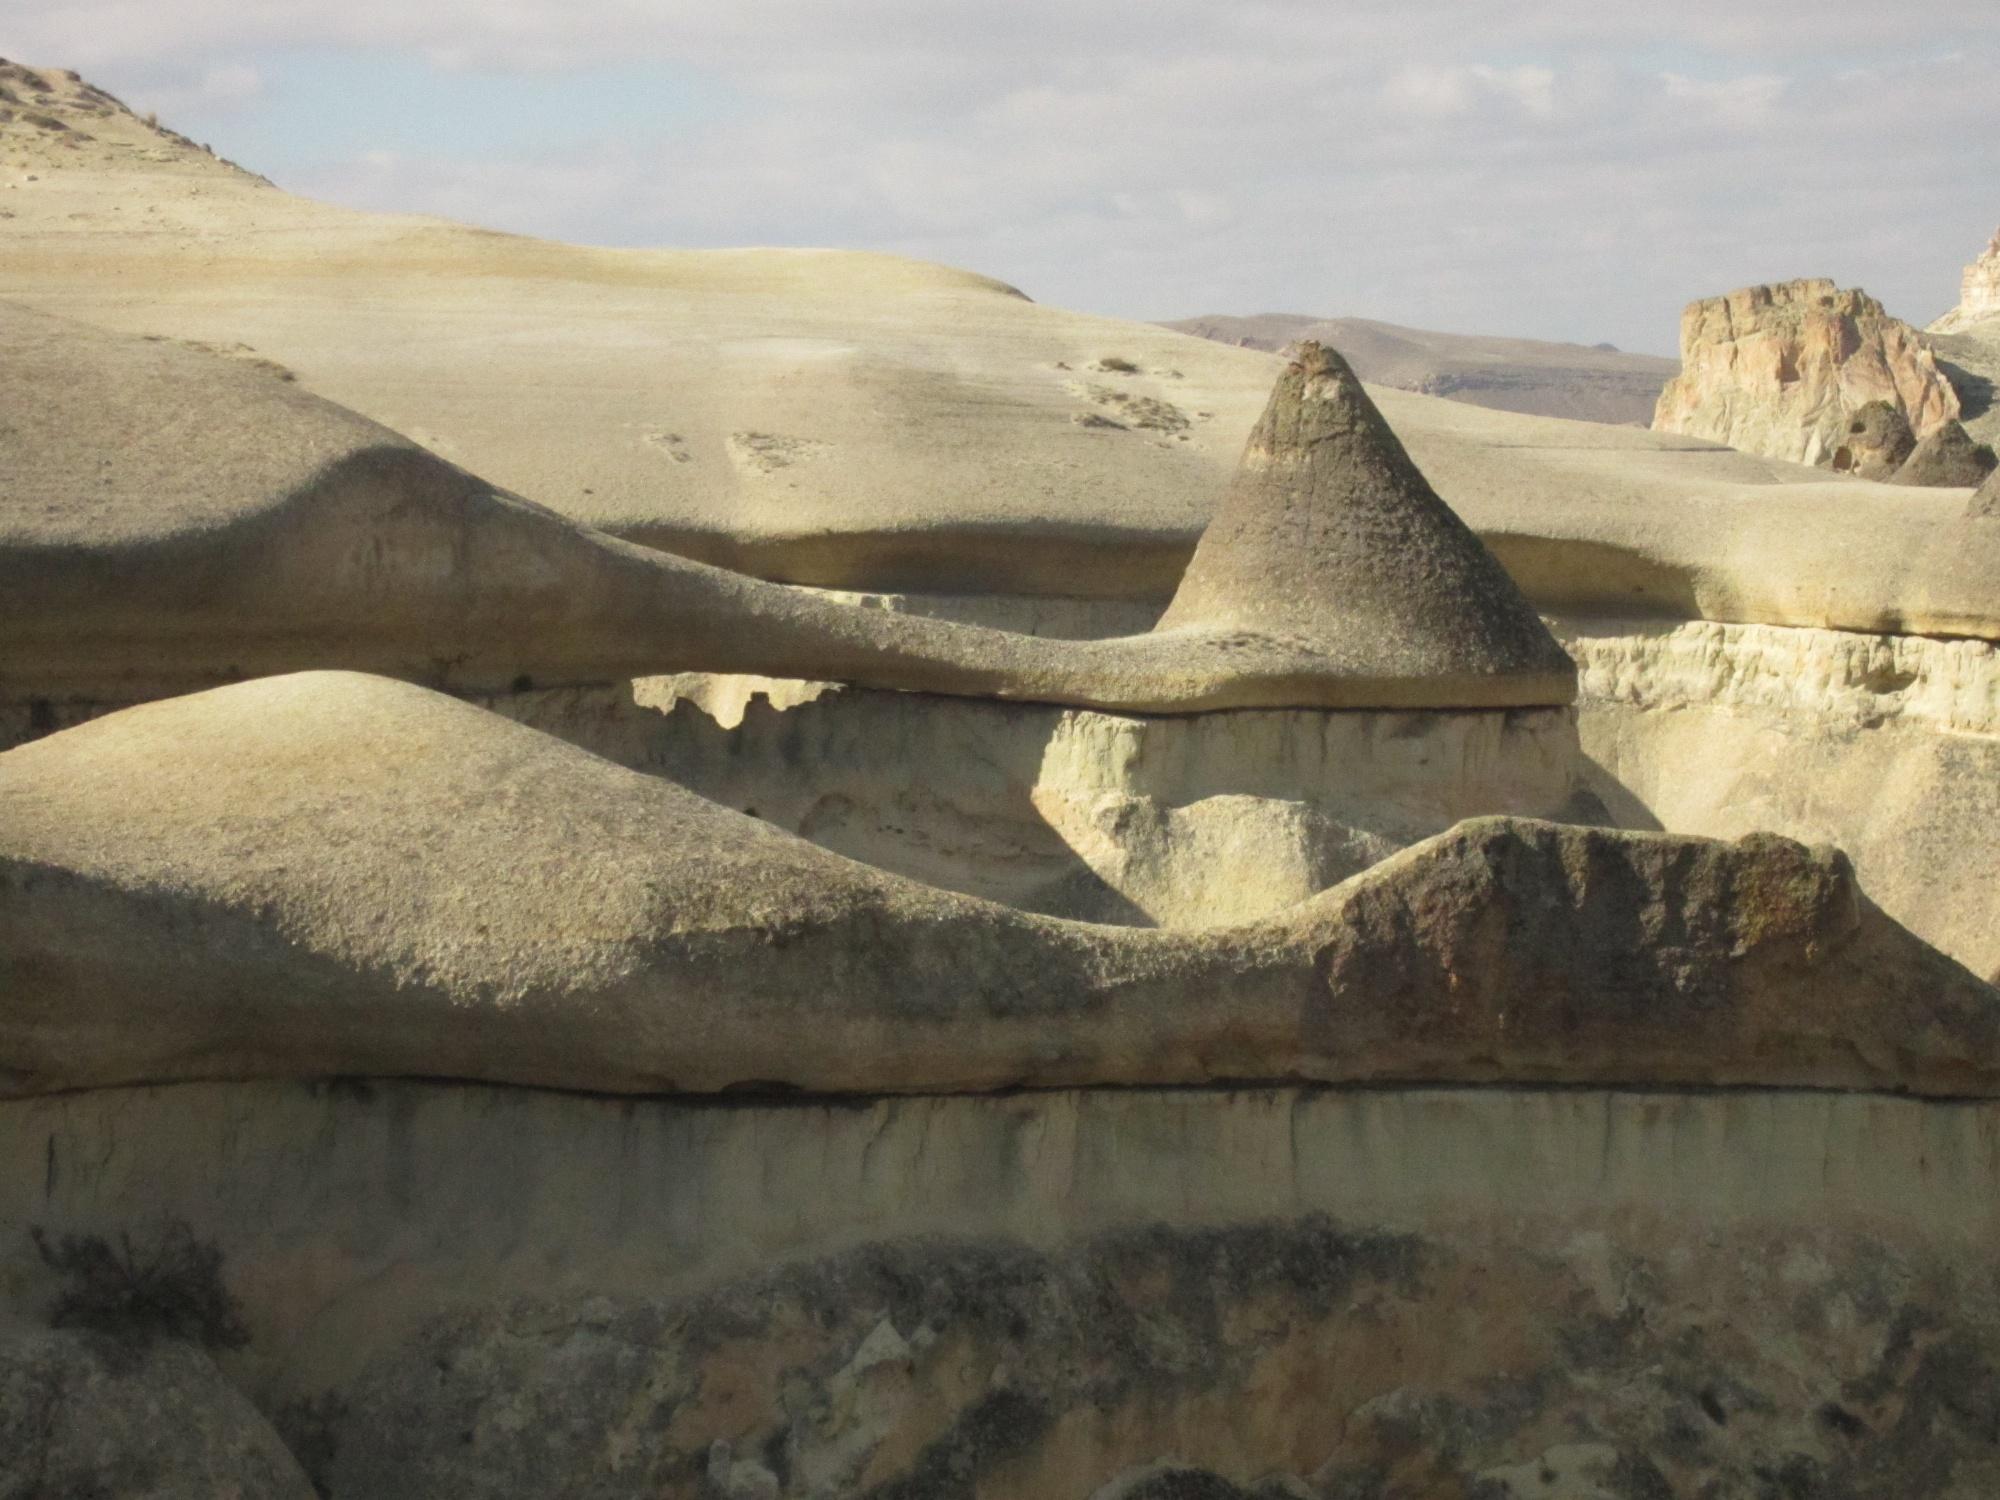 cappadocia-ontheground 23.jpg